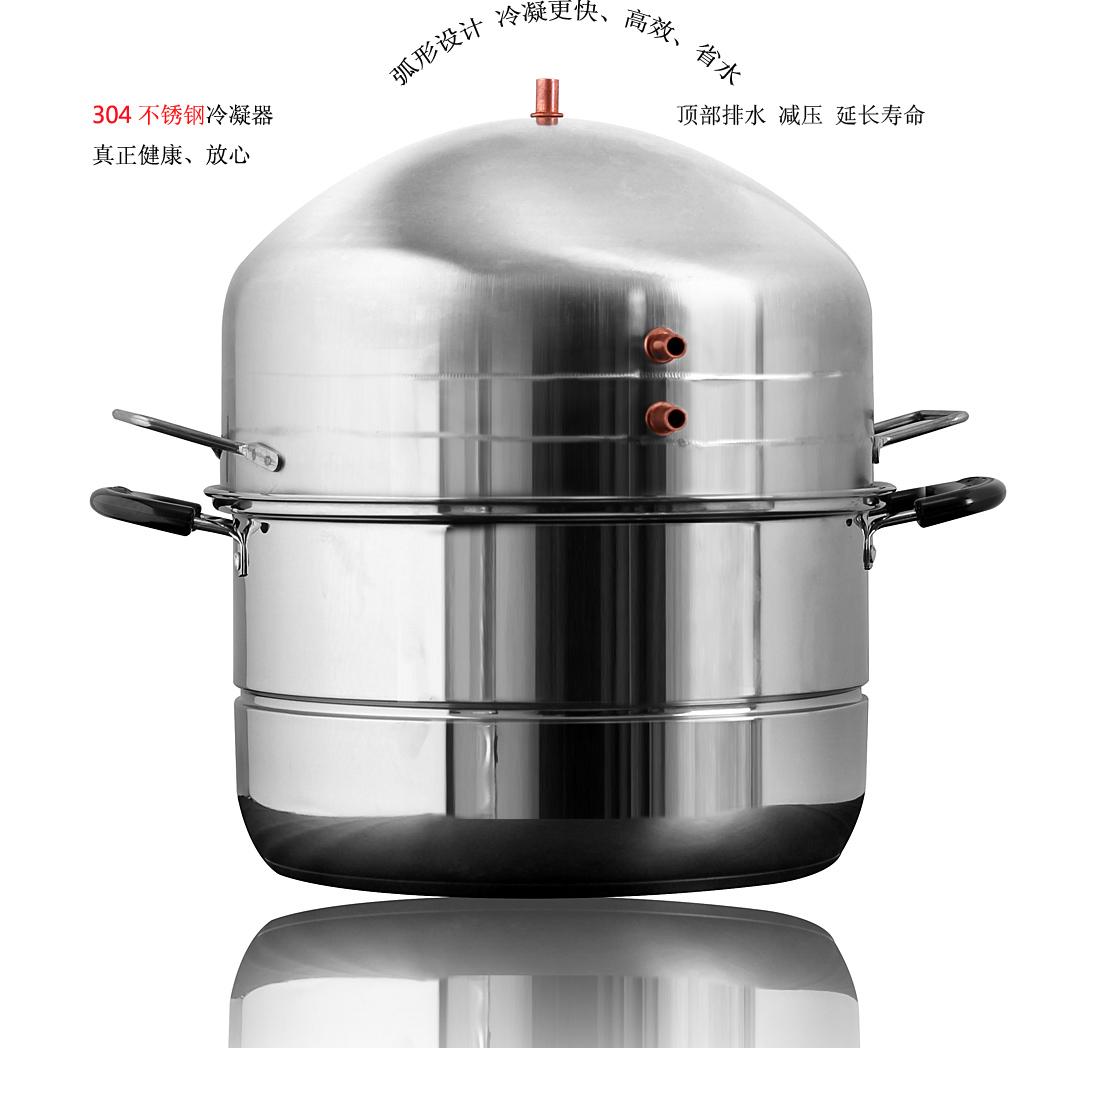 Food wine home wine brewery equipment limbeck racists(China (Mainland))